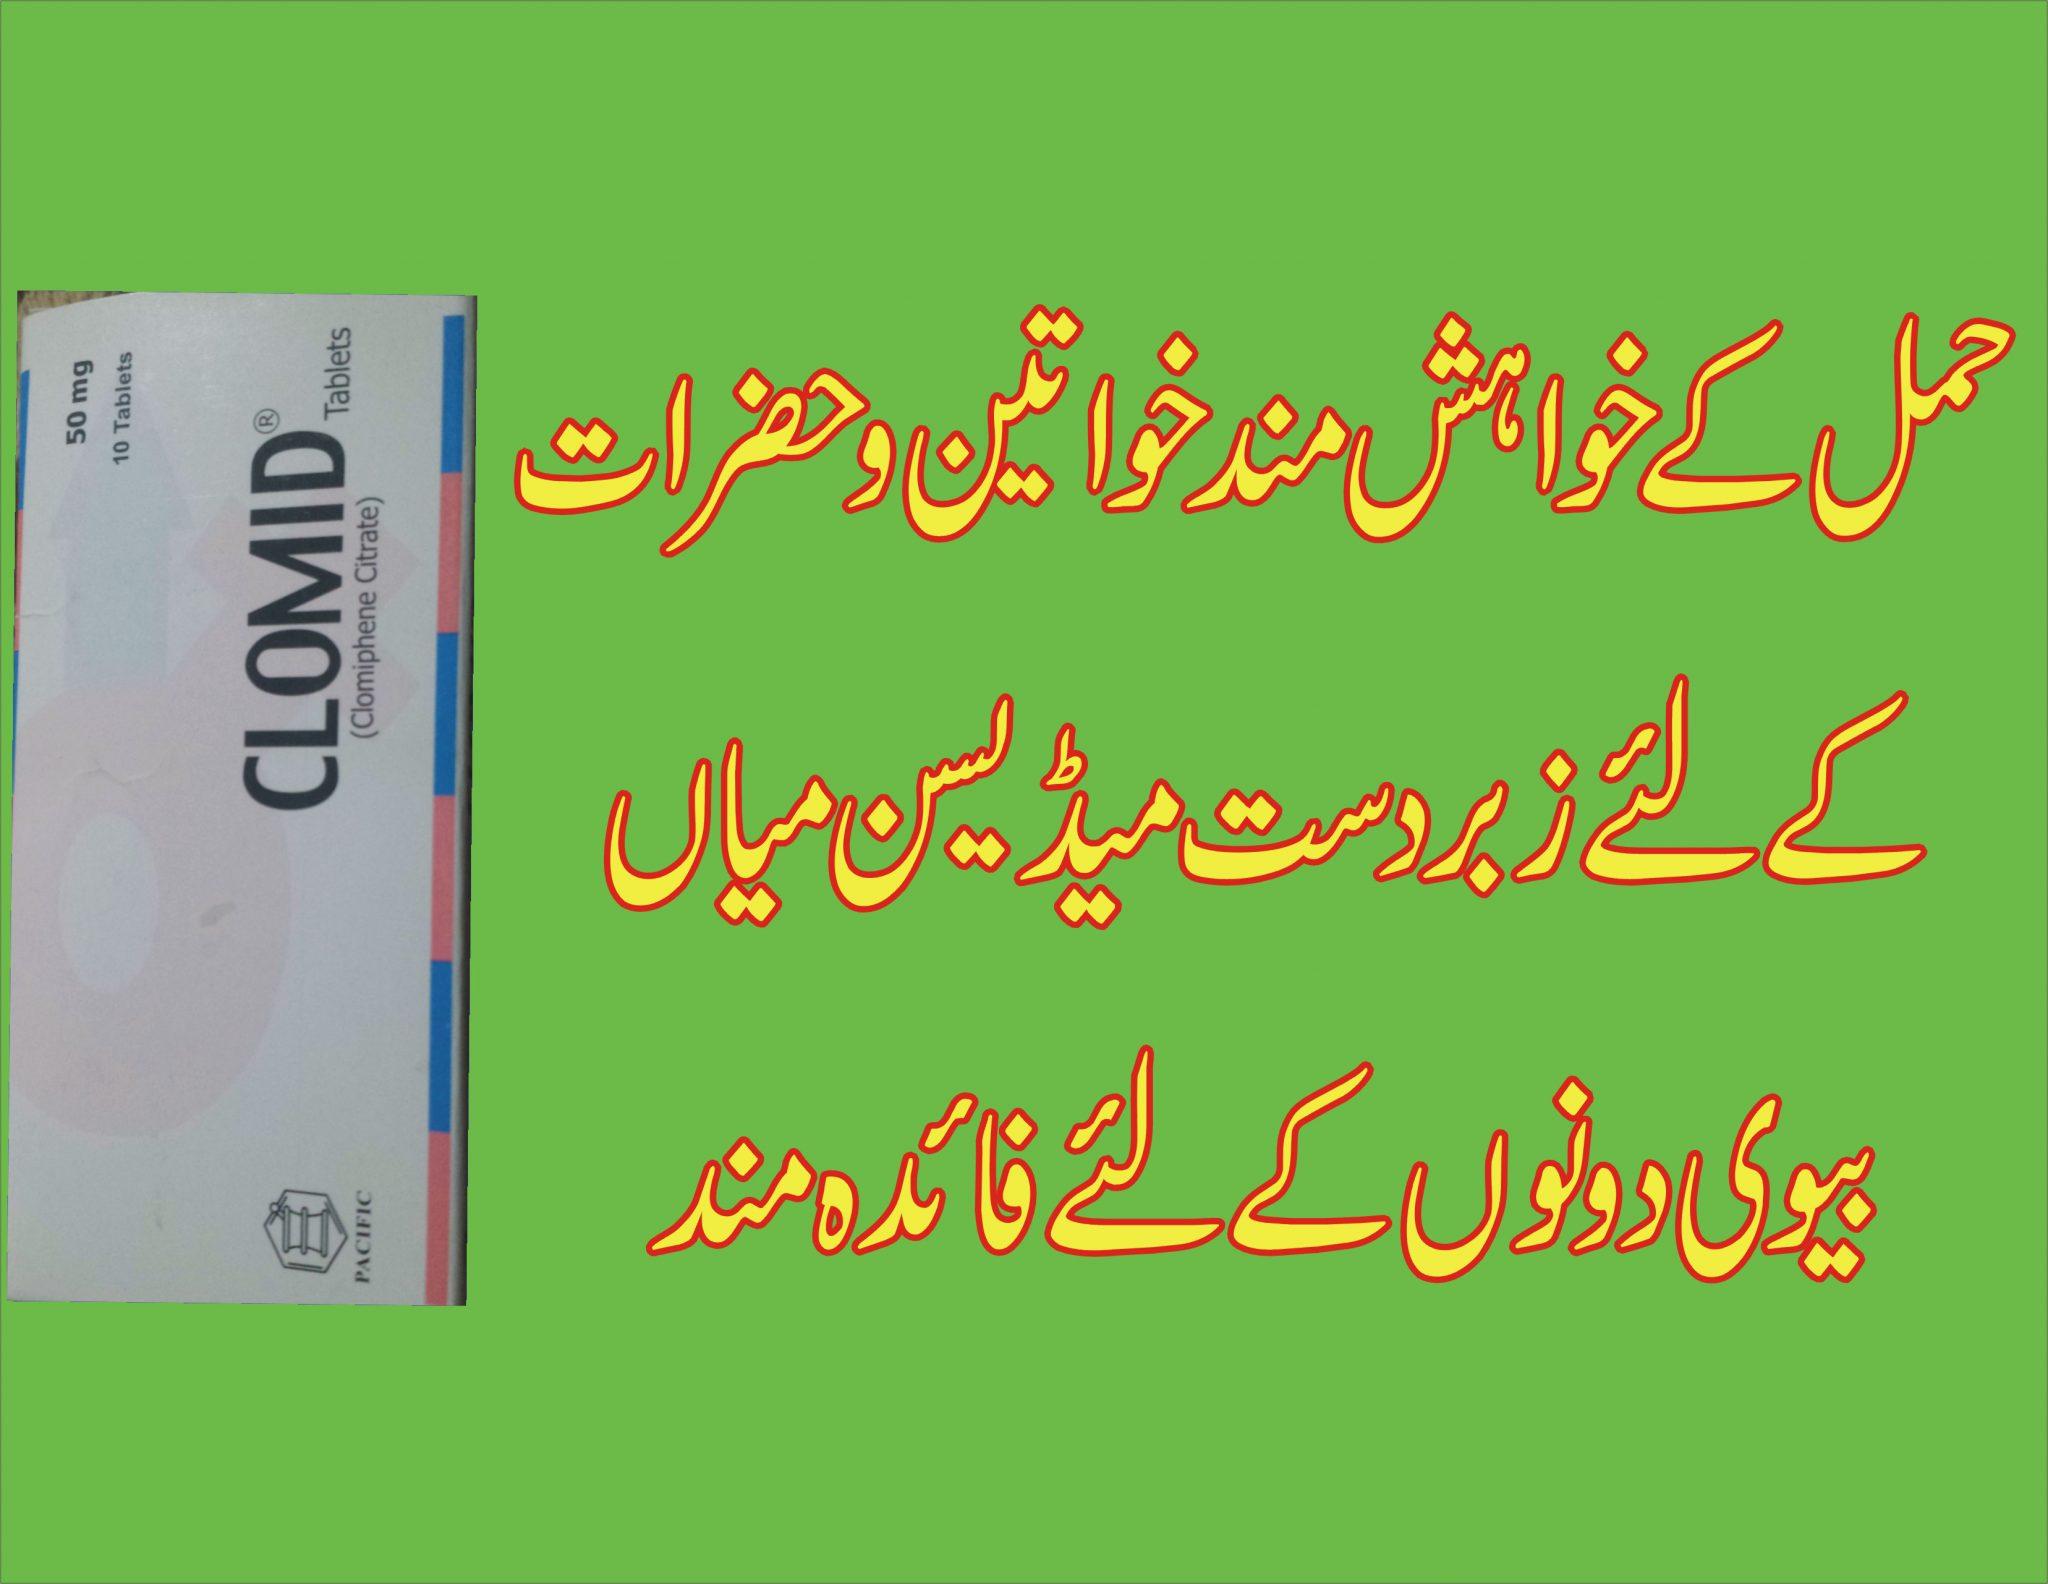 Clomid Tablet - Clomephene Citrat 50mg tablets treat infertility in women